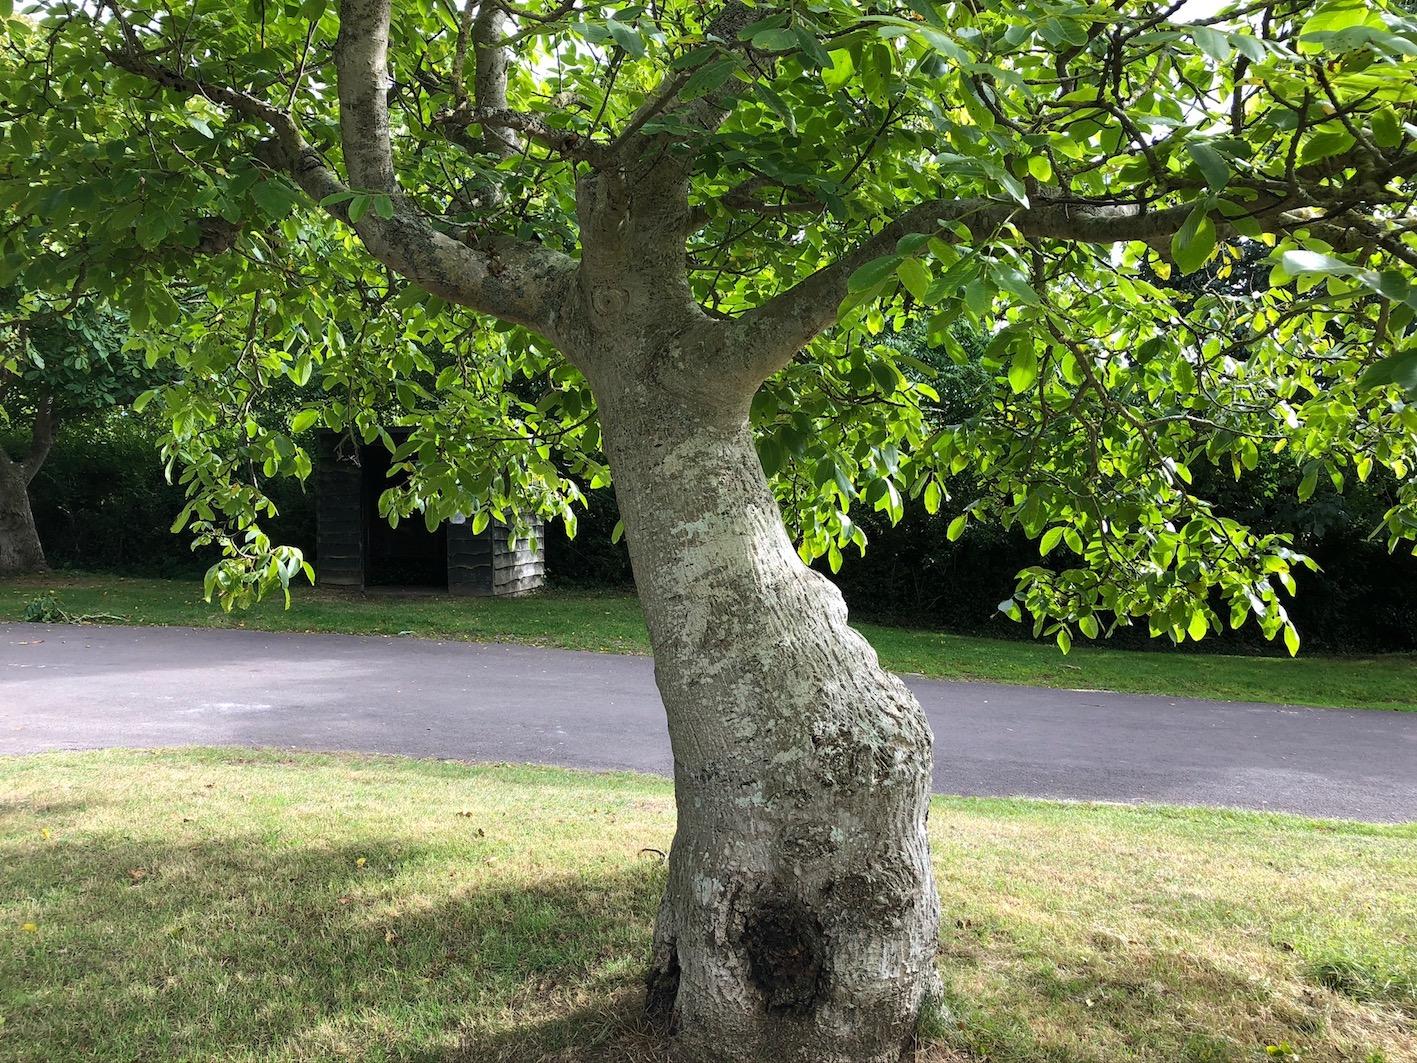 The wayside walnut trees of Porlock Vale